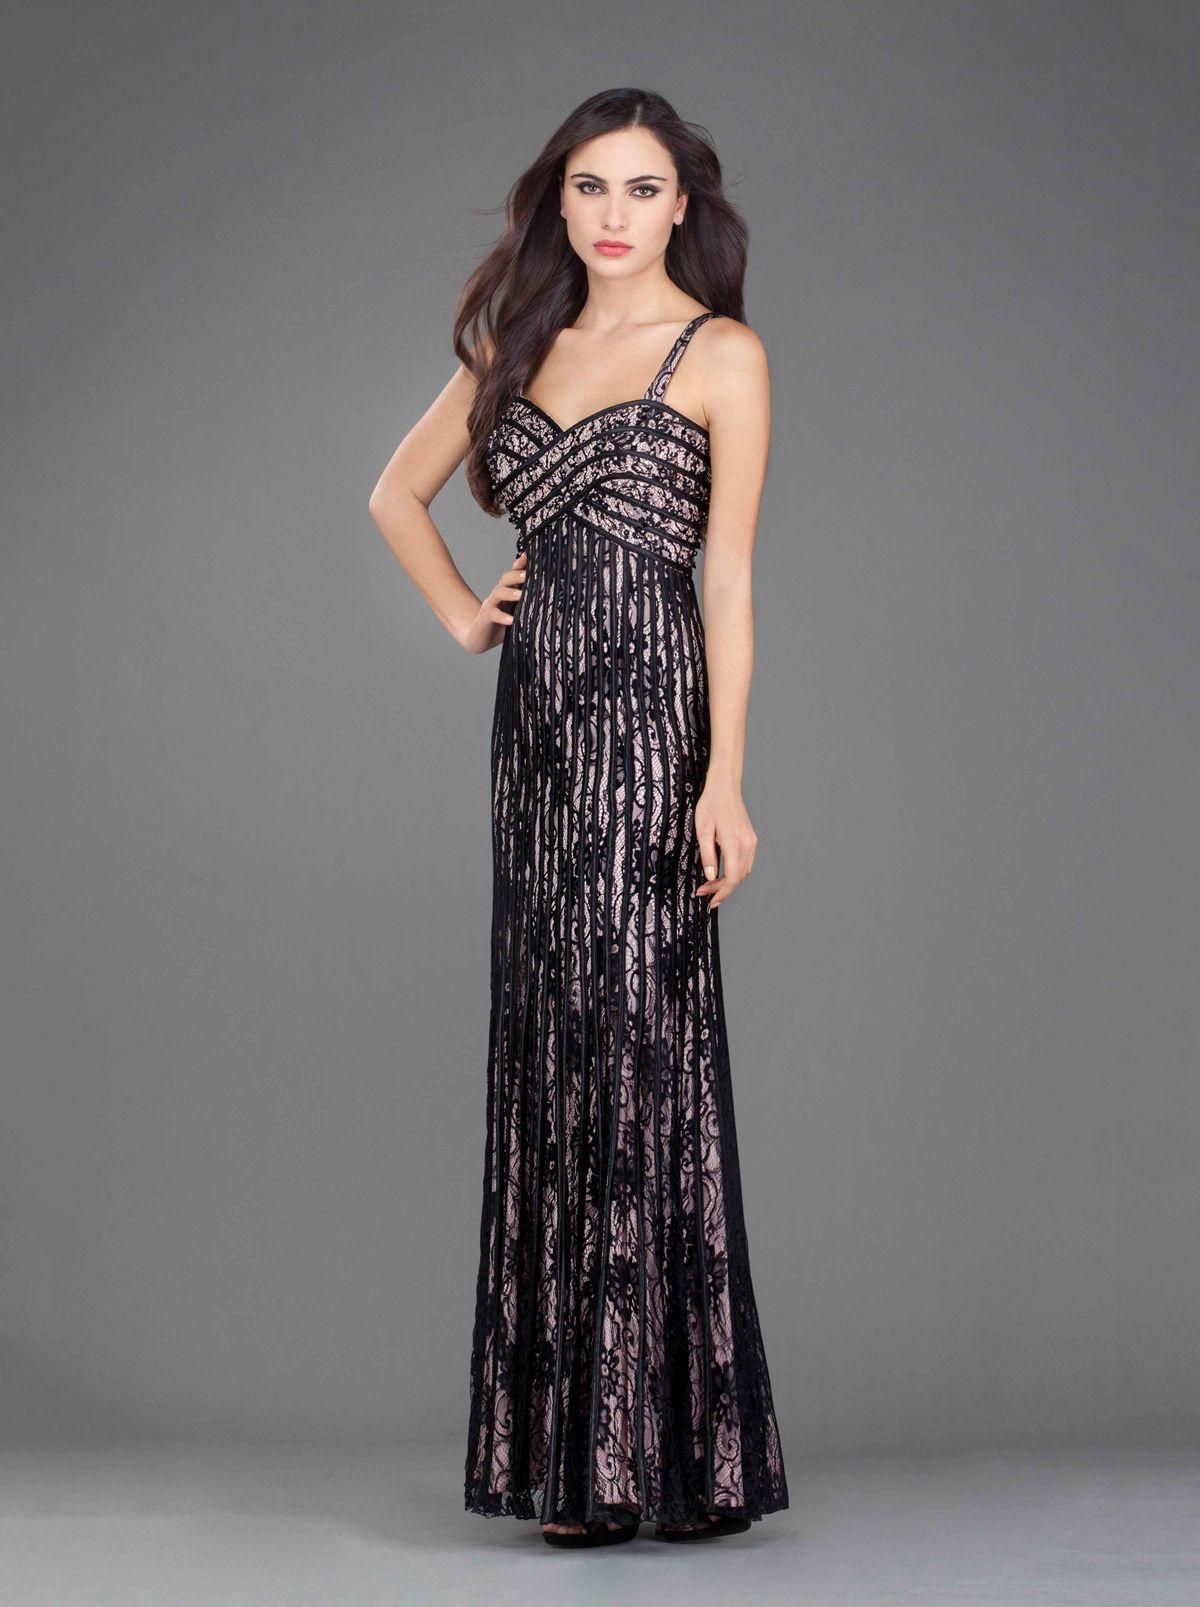 271f82fd0827 ... χρήστη Mikael Evening Dresses. Ετικέτες. Βραδινά Φορέματα · Βραδινά  Φορέματα